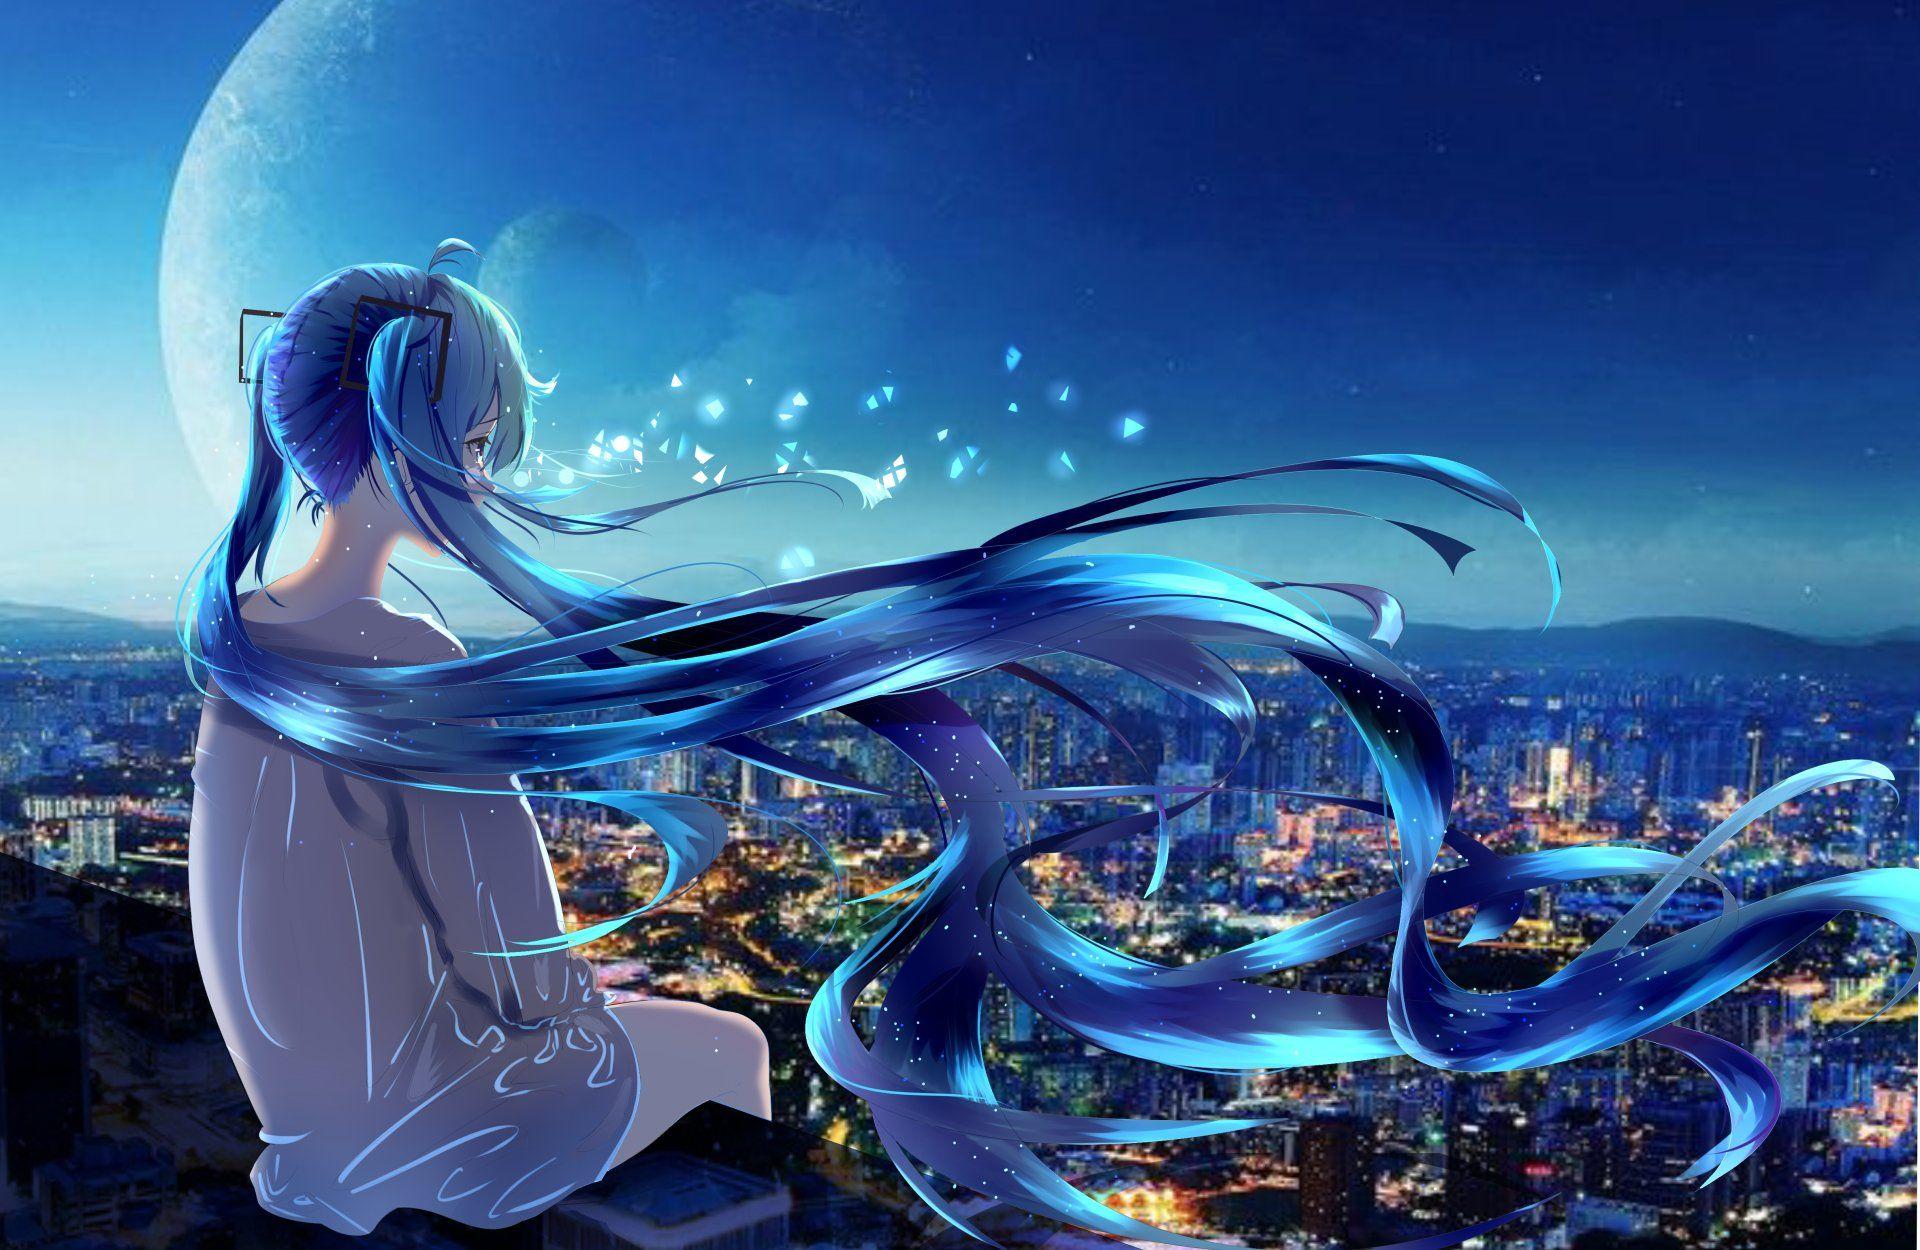 Anime Vocaloid Hatsune Miku Girl Long Hair Blue Hair Wallpaper Anime Wallpaper 1920x1080 Blue Anime Anime Wallpaper Iphone Anime vocaloid wallpaper hd